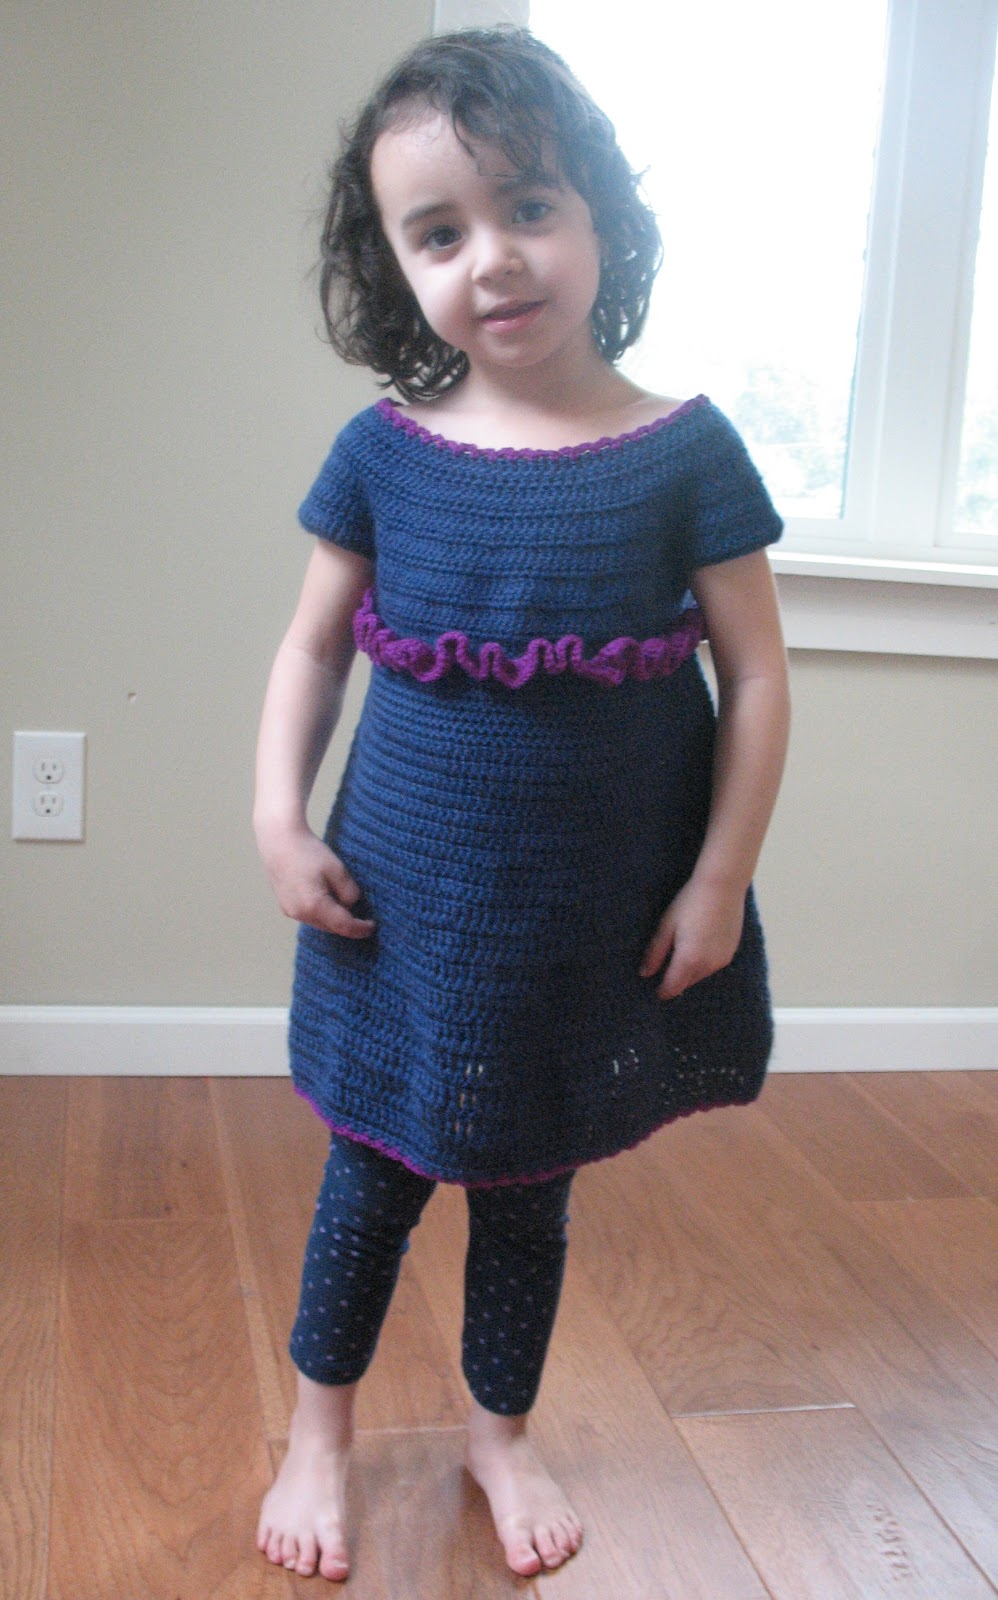 Child Crochet Dress - Pattern Free Easy. | Baby Patterns